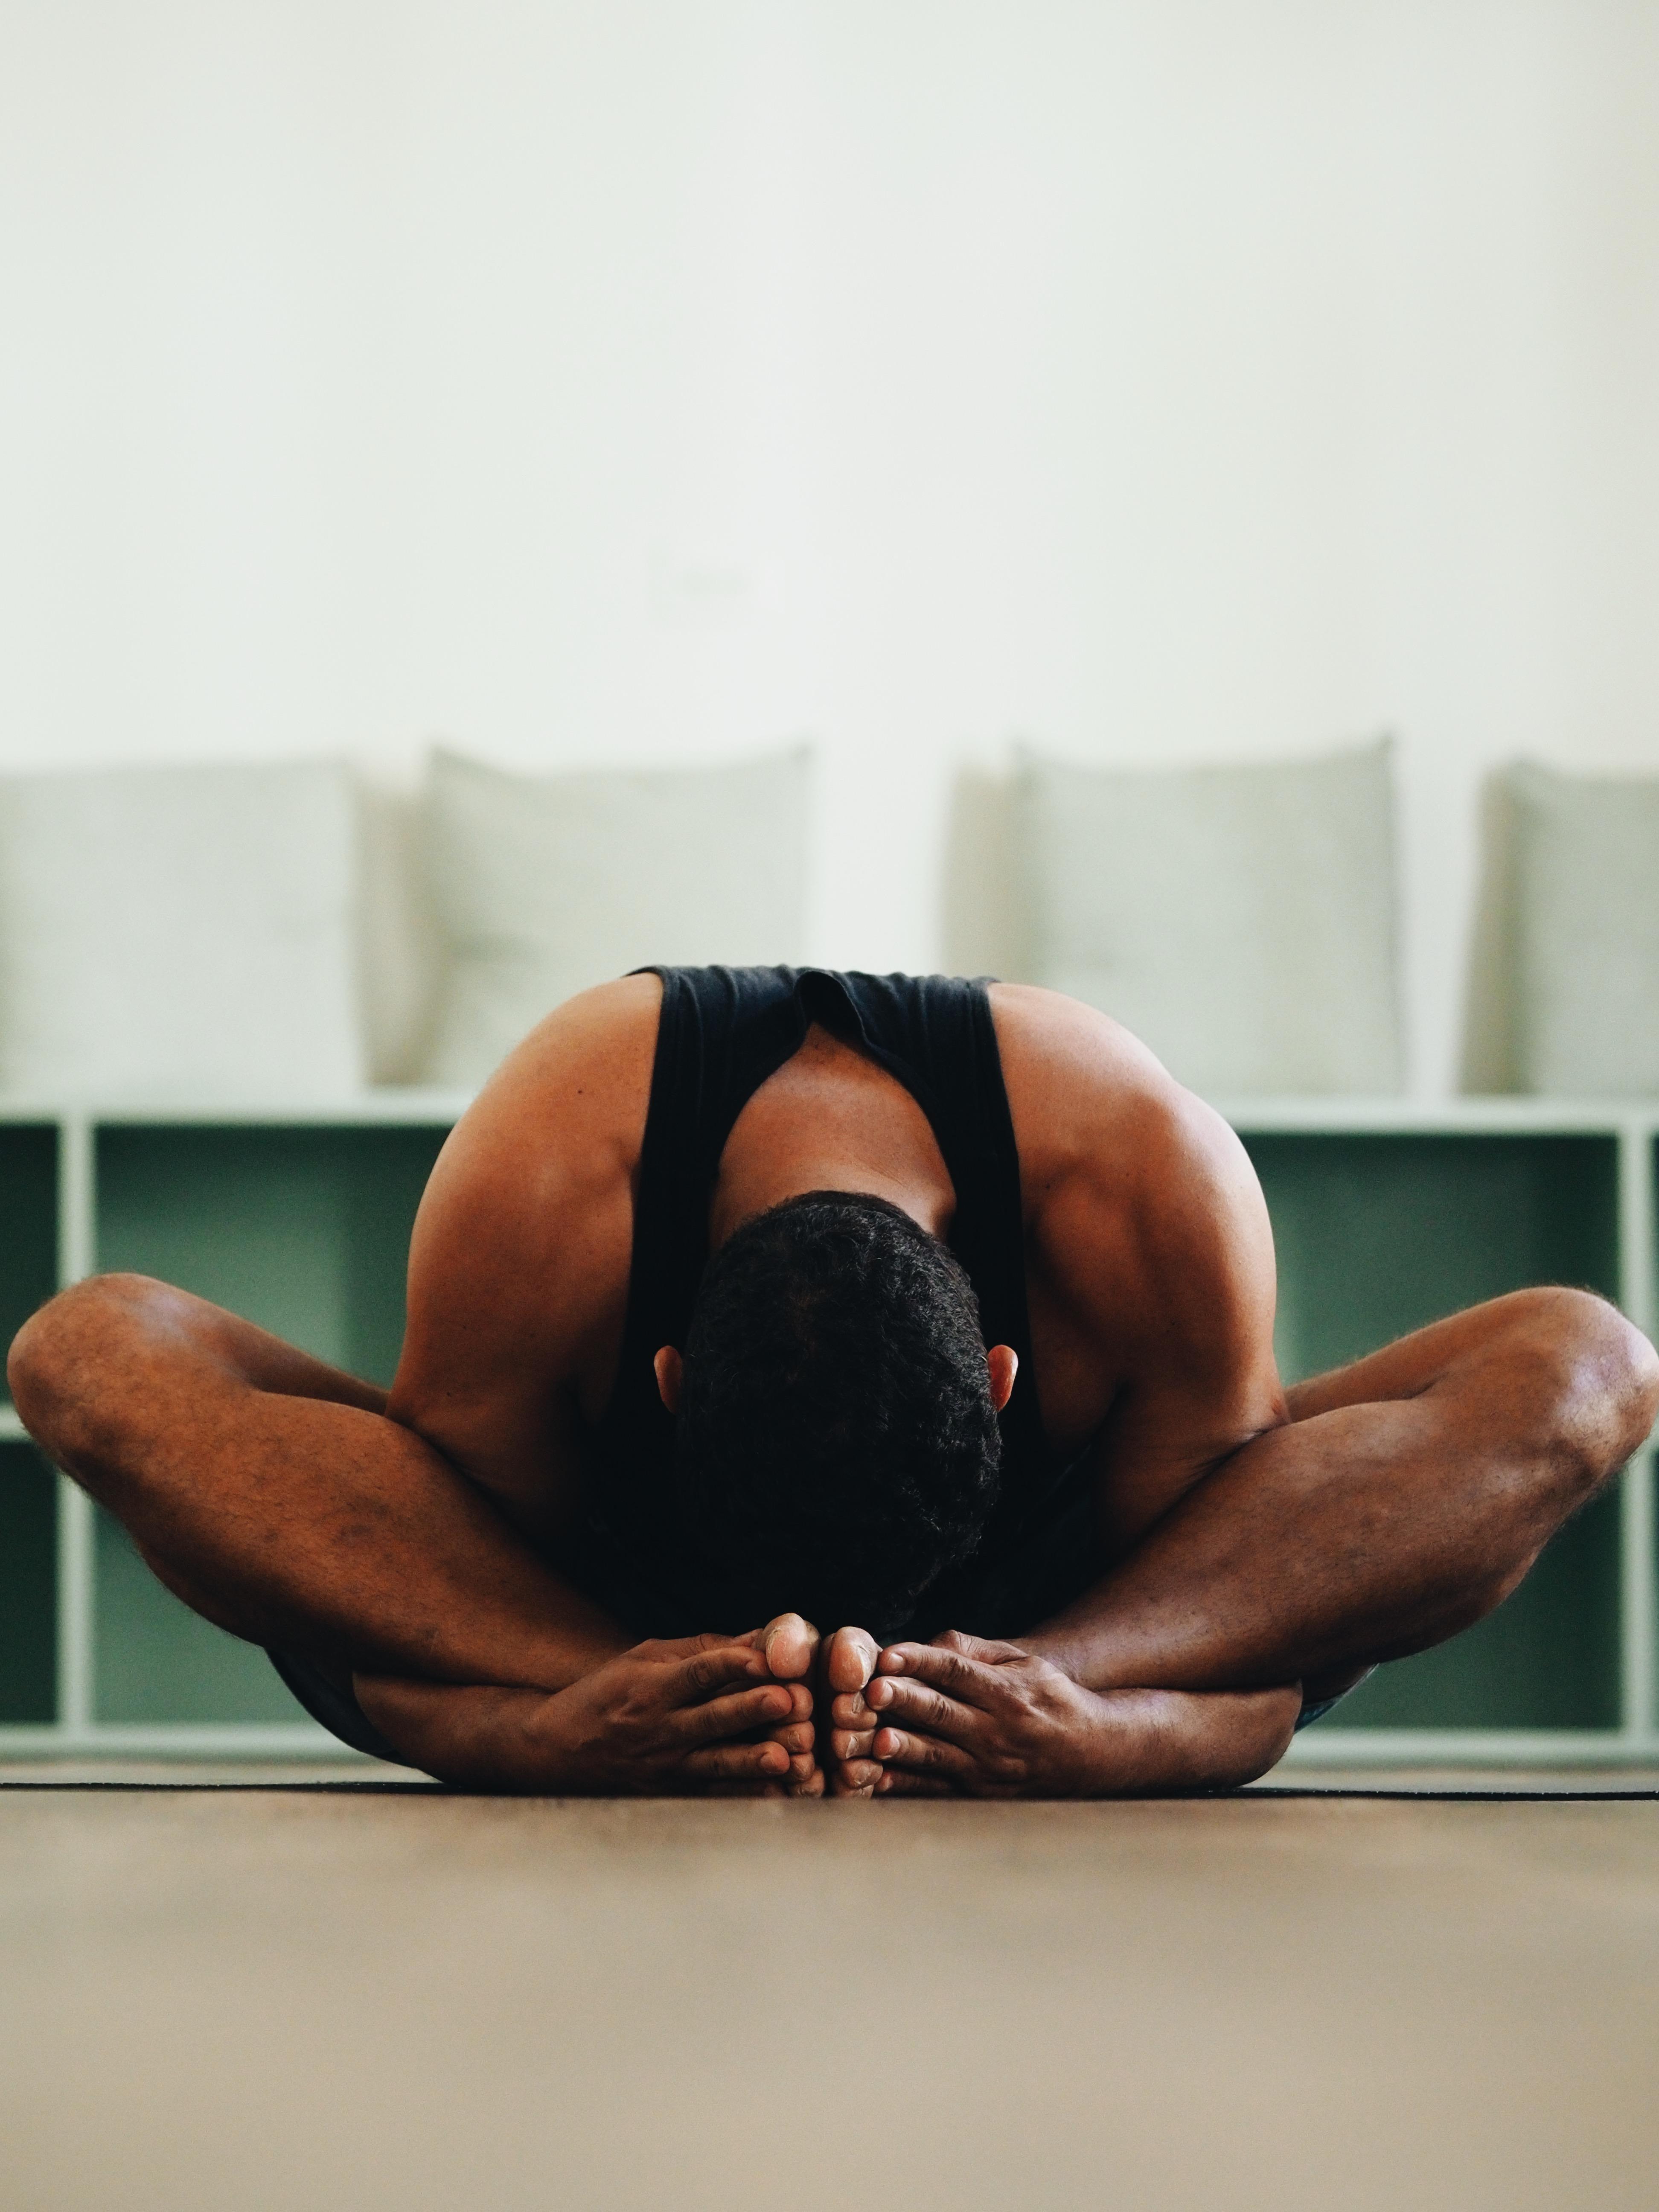 Yoga Nidra Panama. Casco Yoga Panama, Yoga Studio. Casco Viejo. Panama City, Panama. Yoga Panama. Ashtanga yoga panama. Vinyasa yoga panama. clases de yoga en panama. Casco Antiguo Panama. boutique yoga studio.